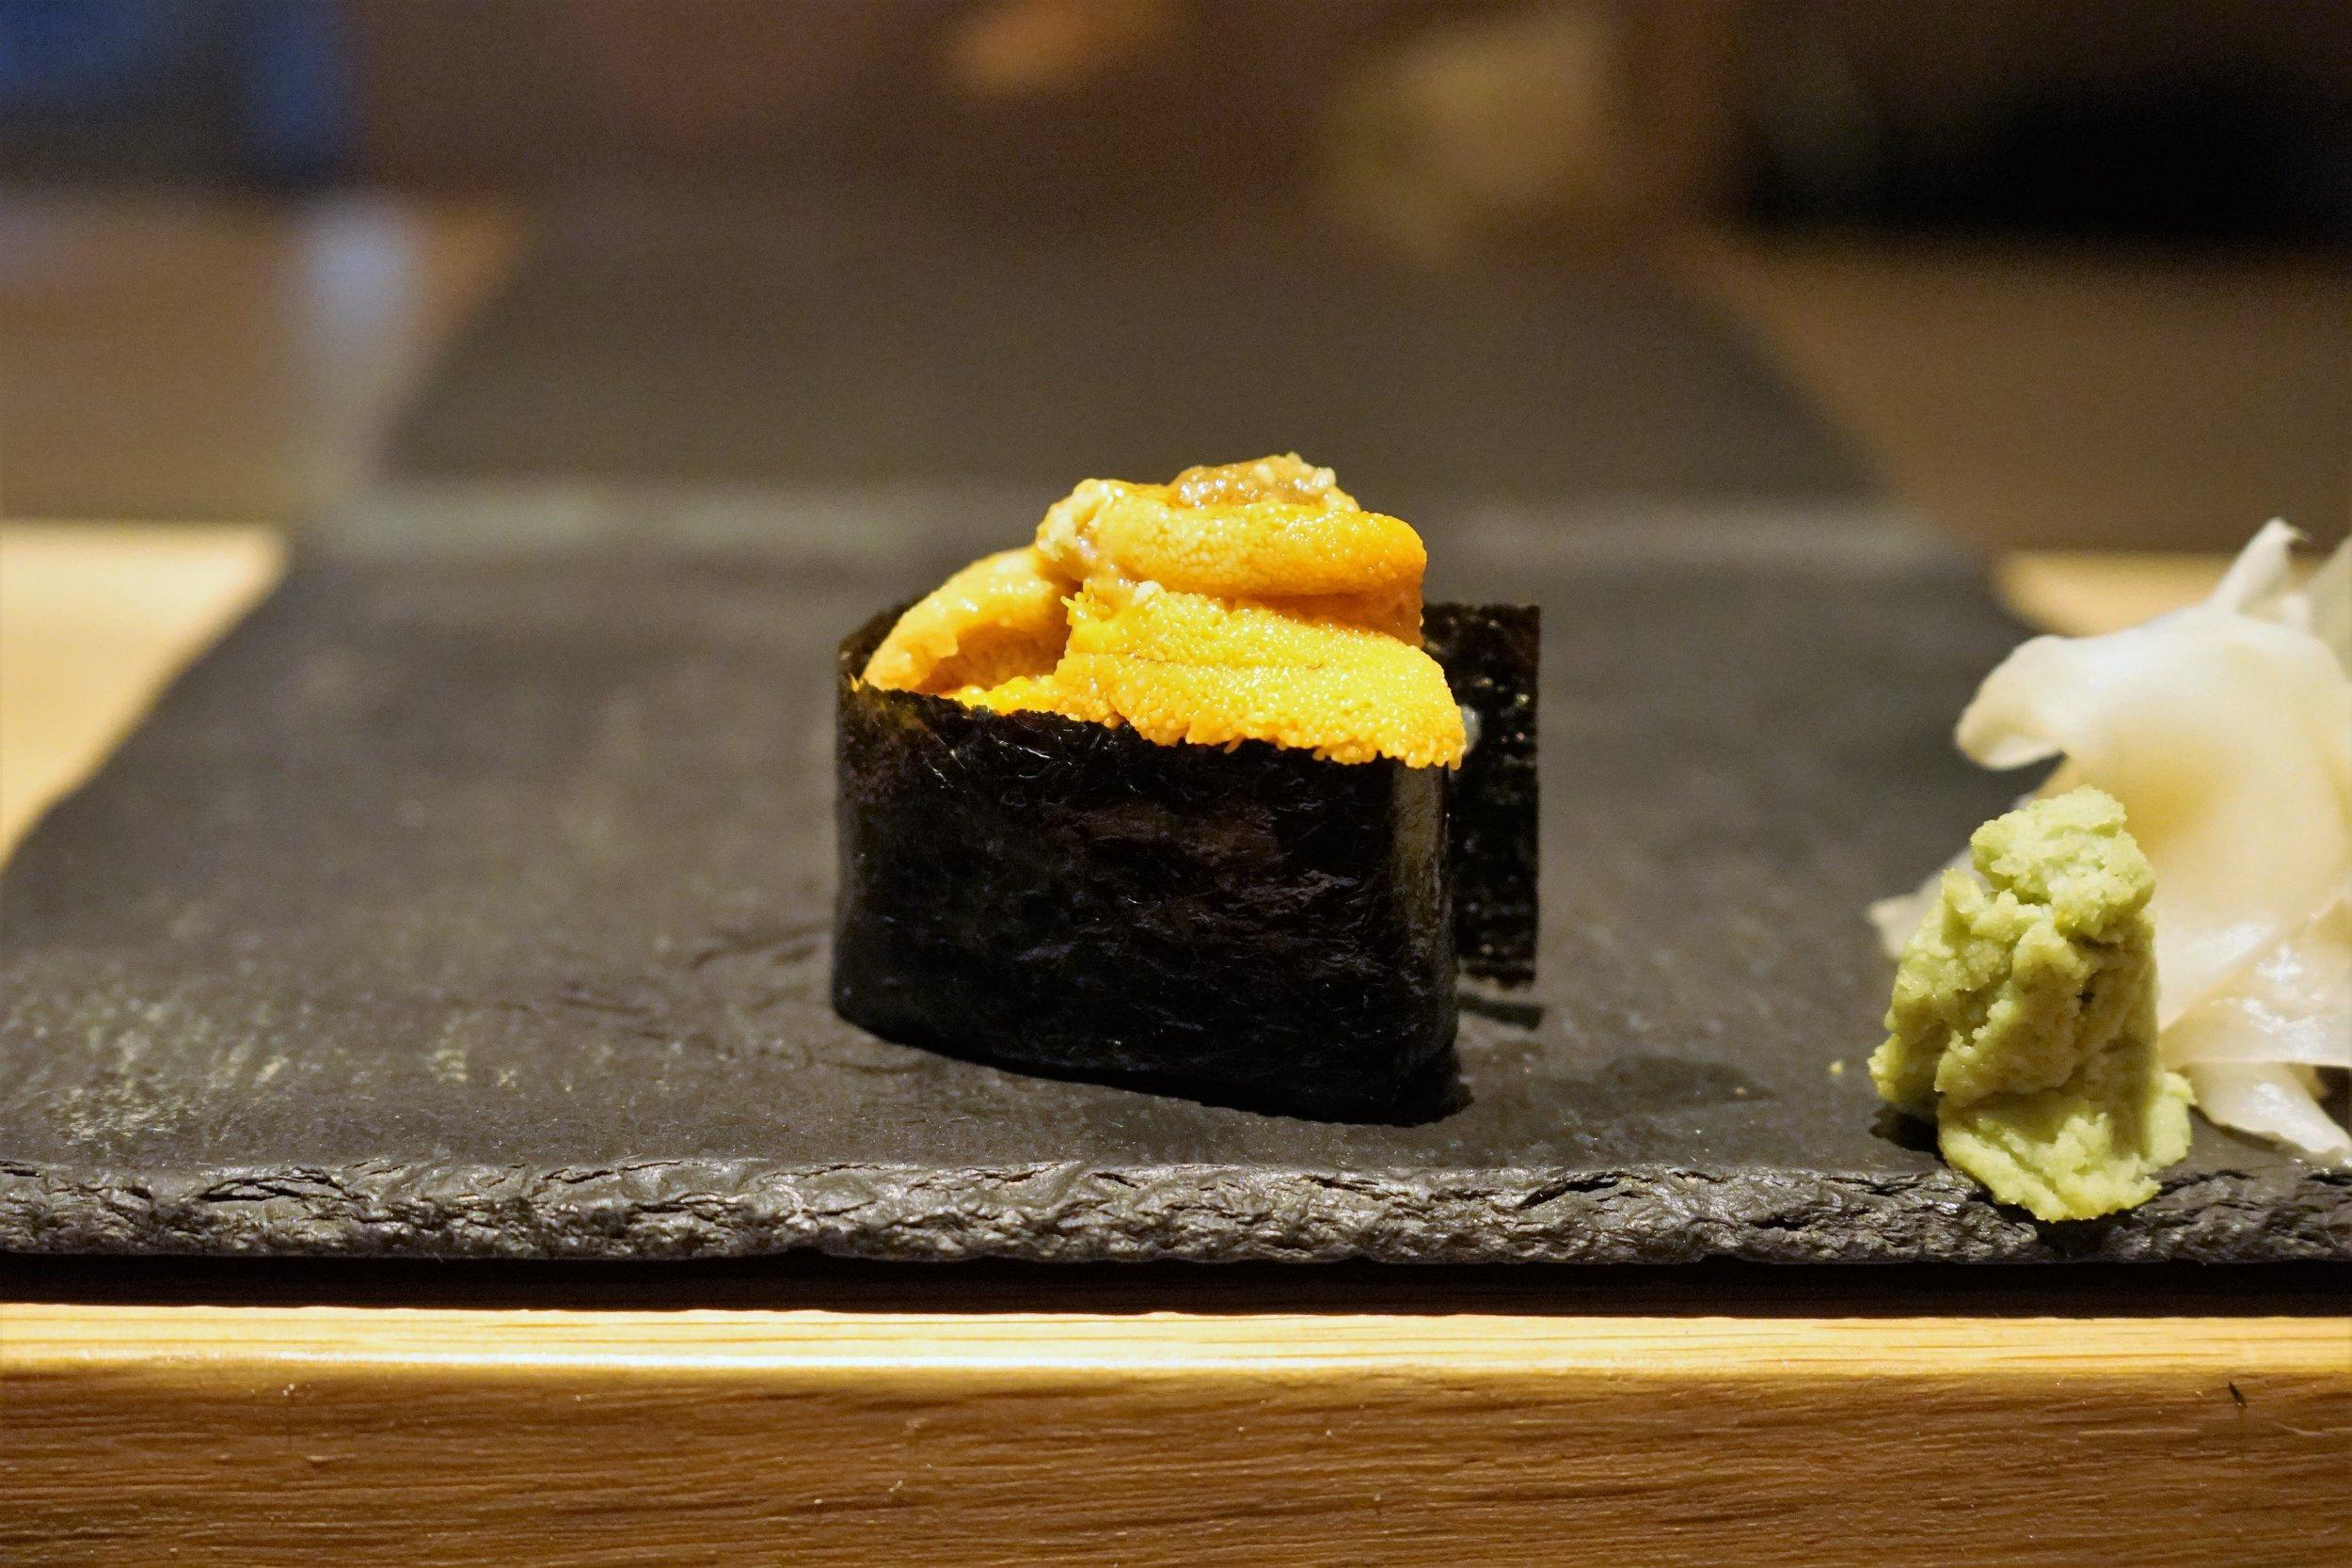 Uni Sushi at DOMODOMO in New York City